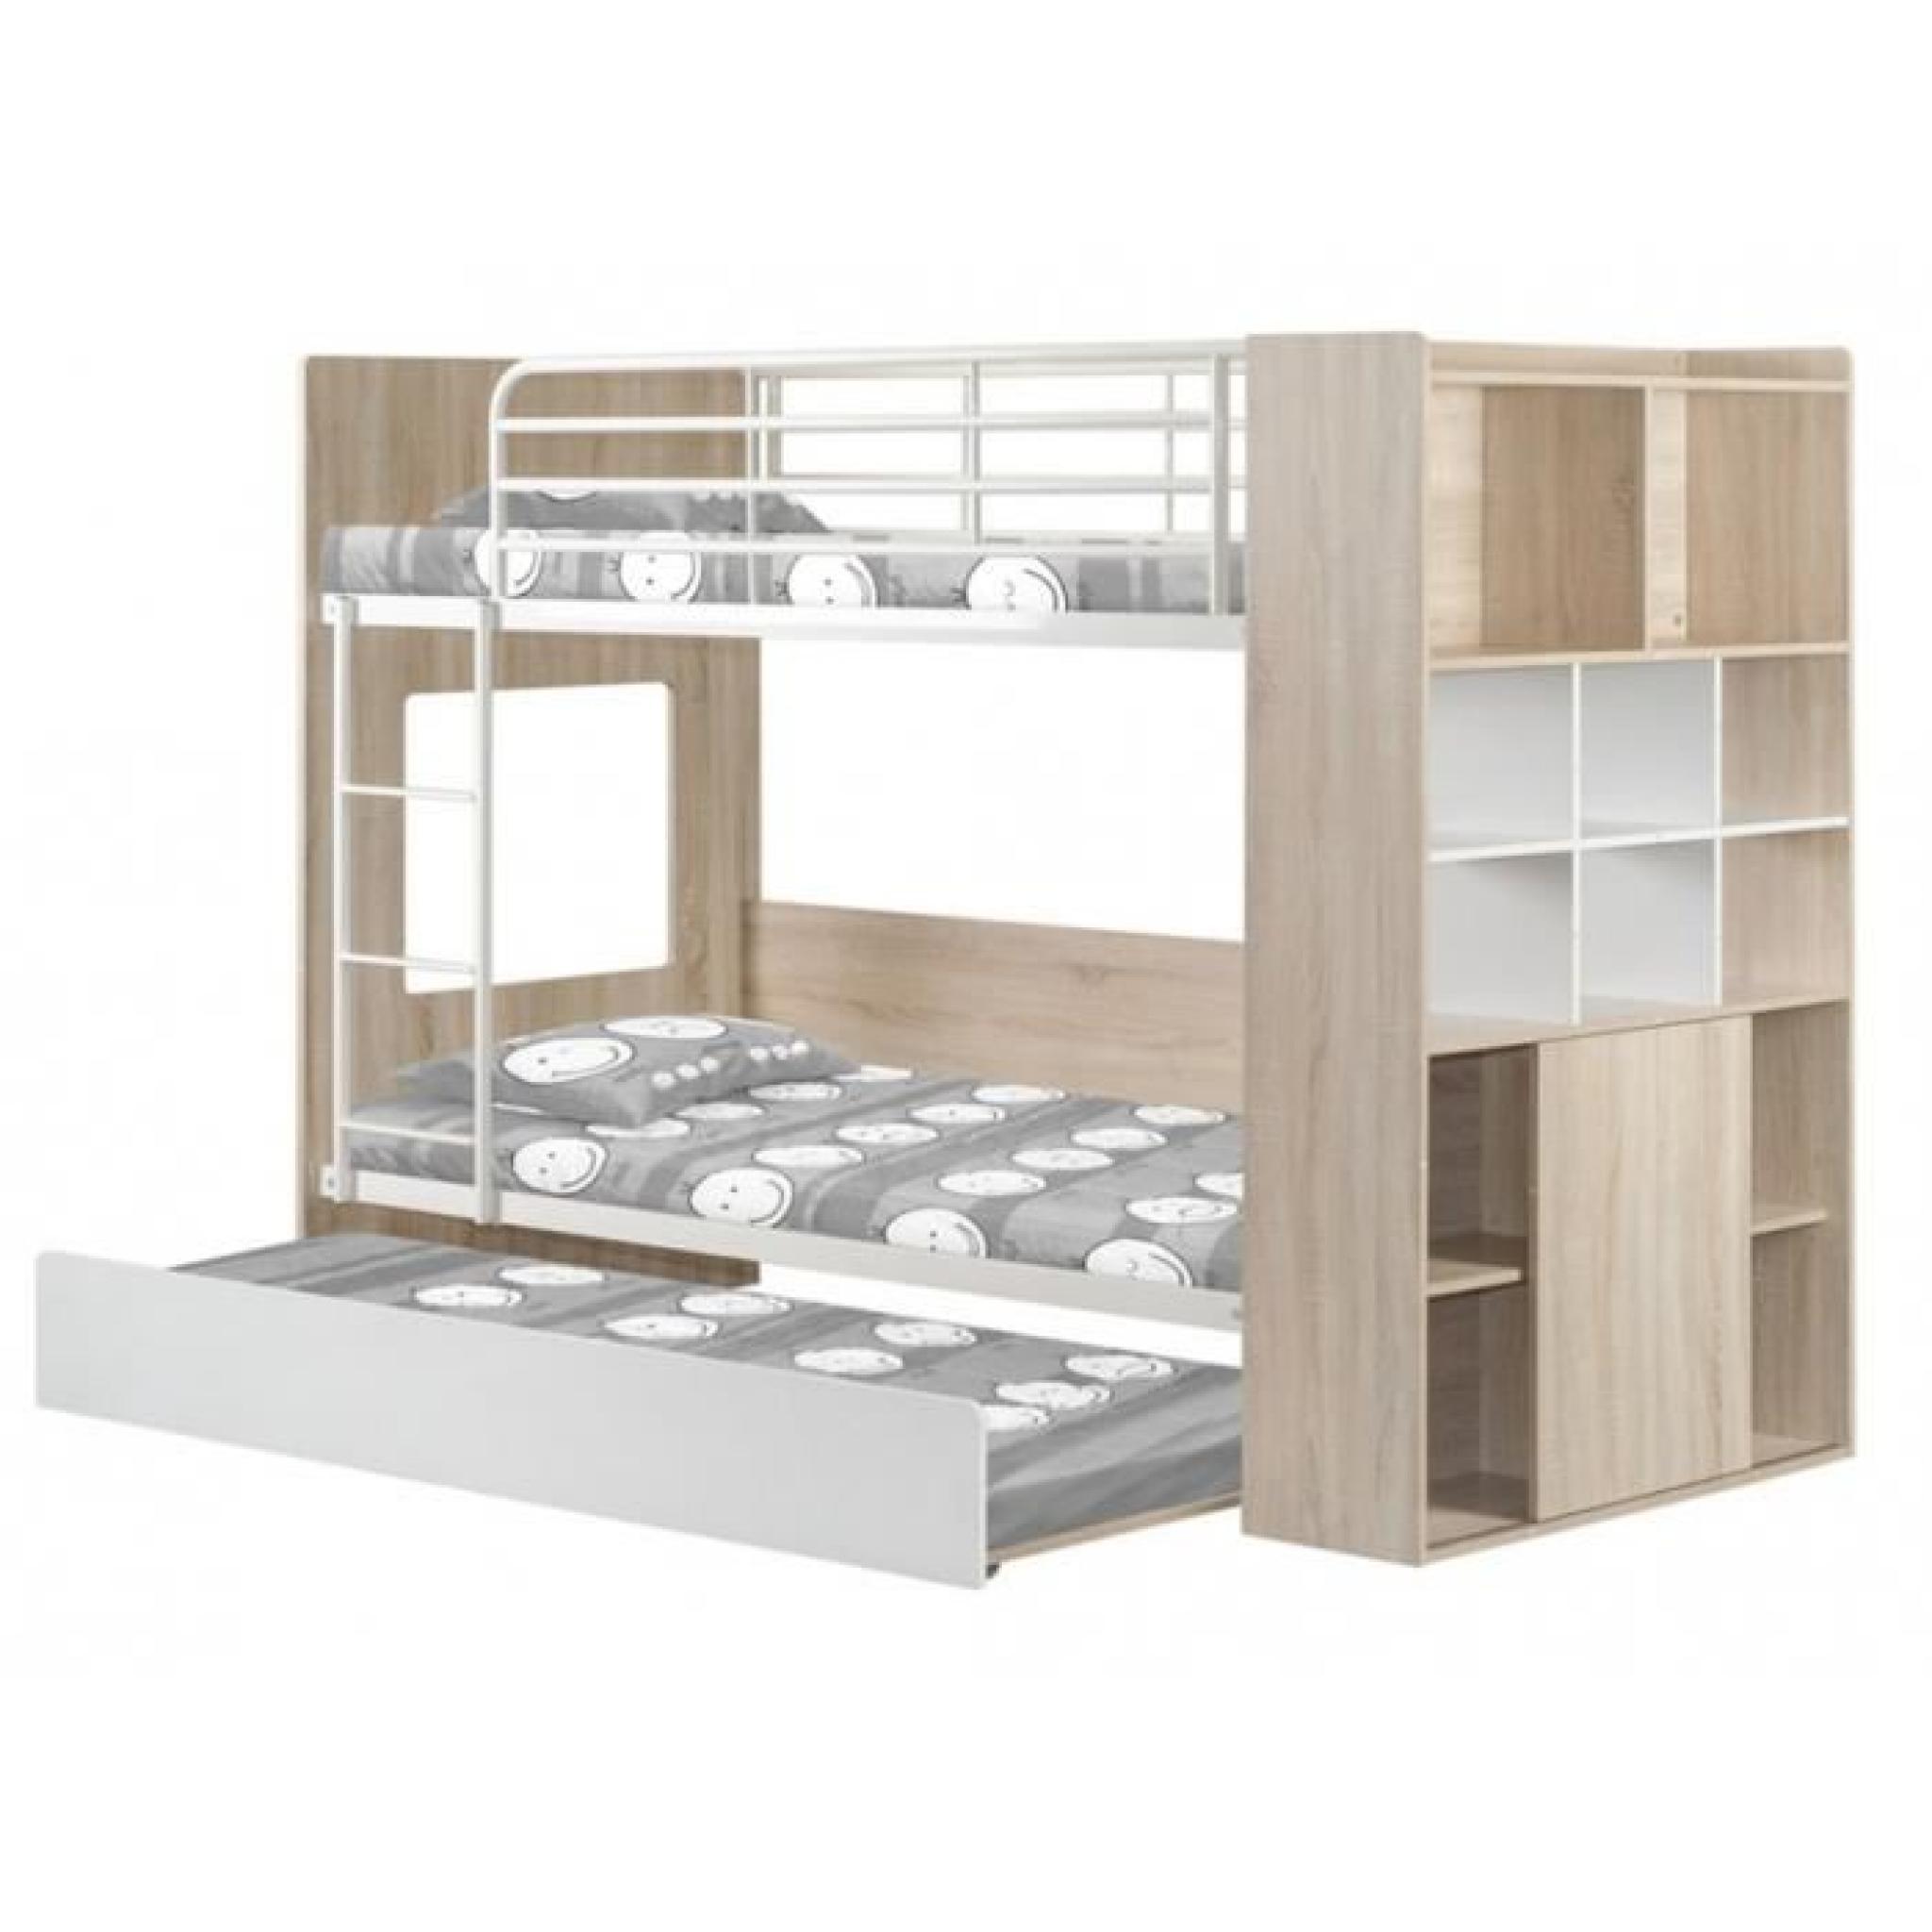 lits superpos s marcus avec lit gigogne etag res int gr es blanc achat vente lit superpose. Black Bedroom Furniture Sets. Home Design Ideas